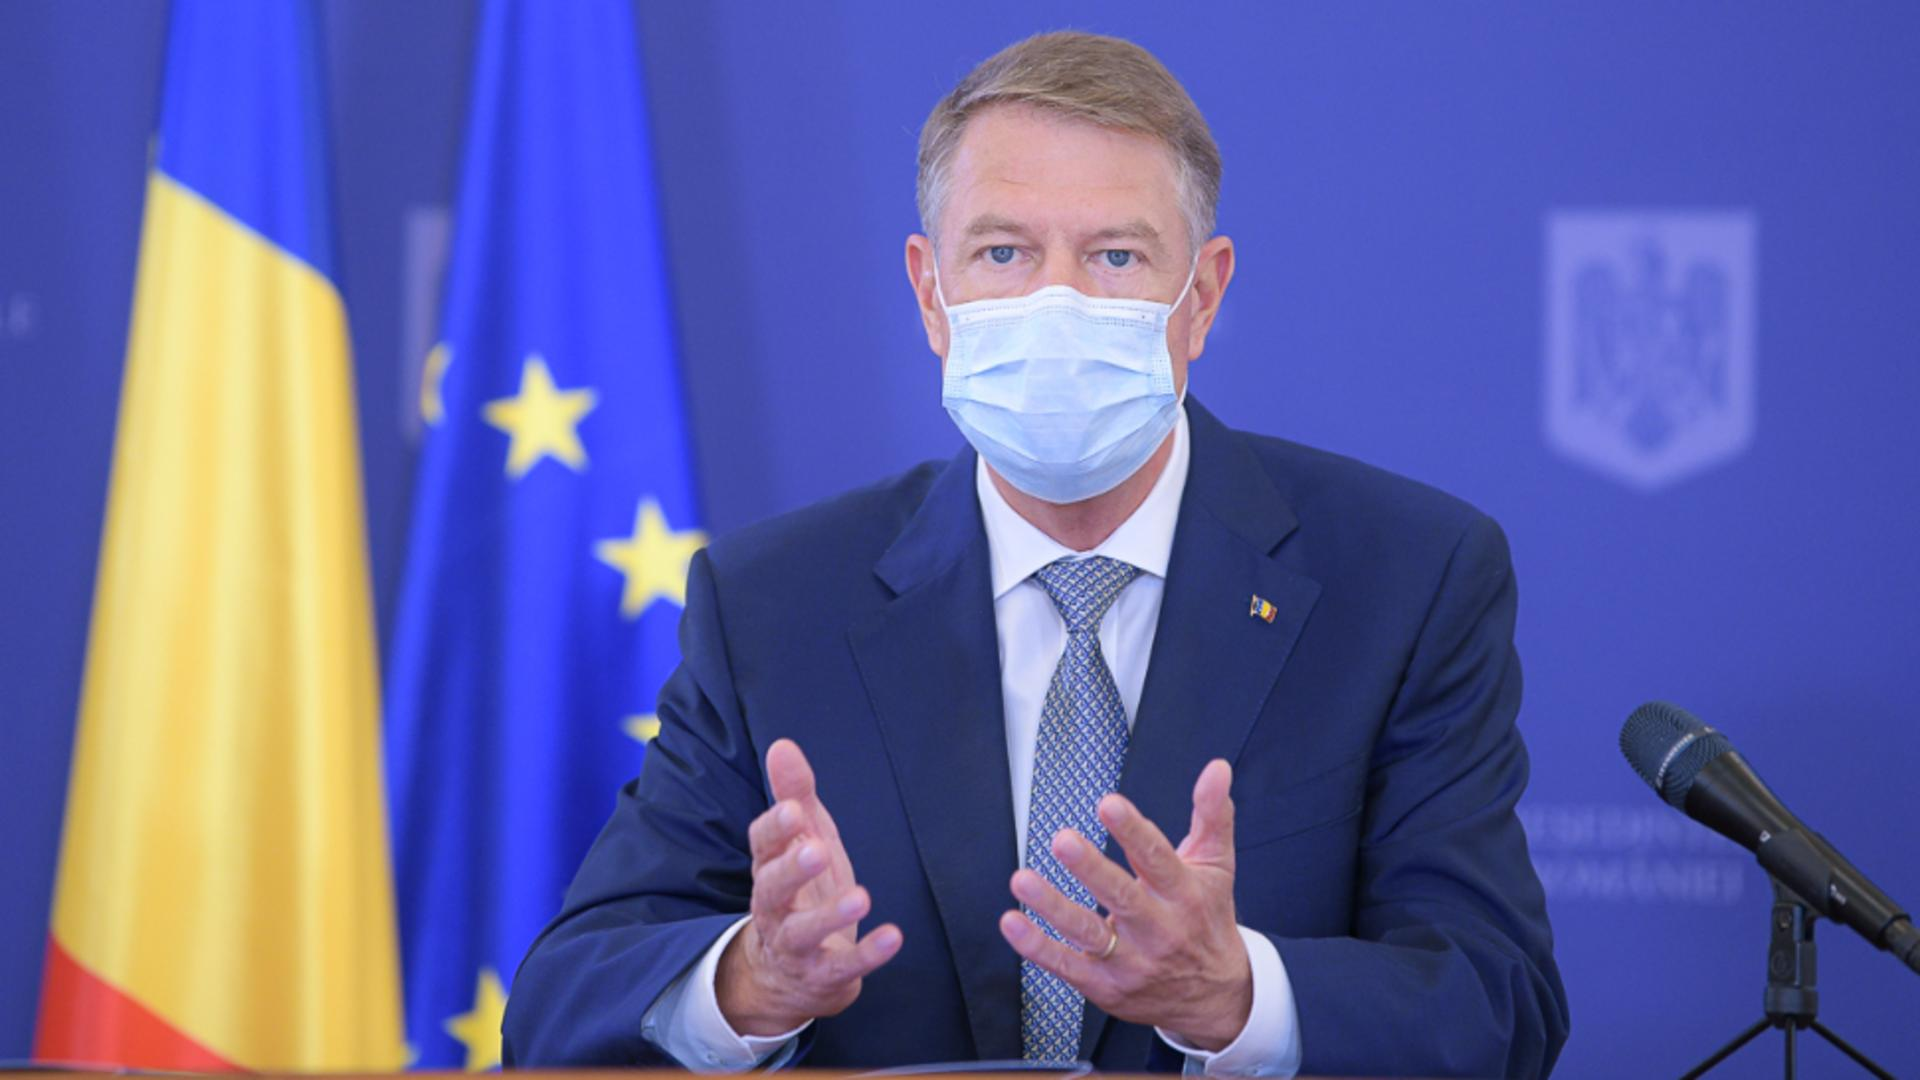 Klaus Iohannis / Foto: Administrația Prezidențială